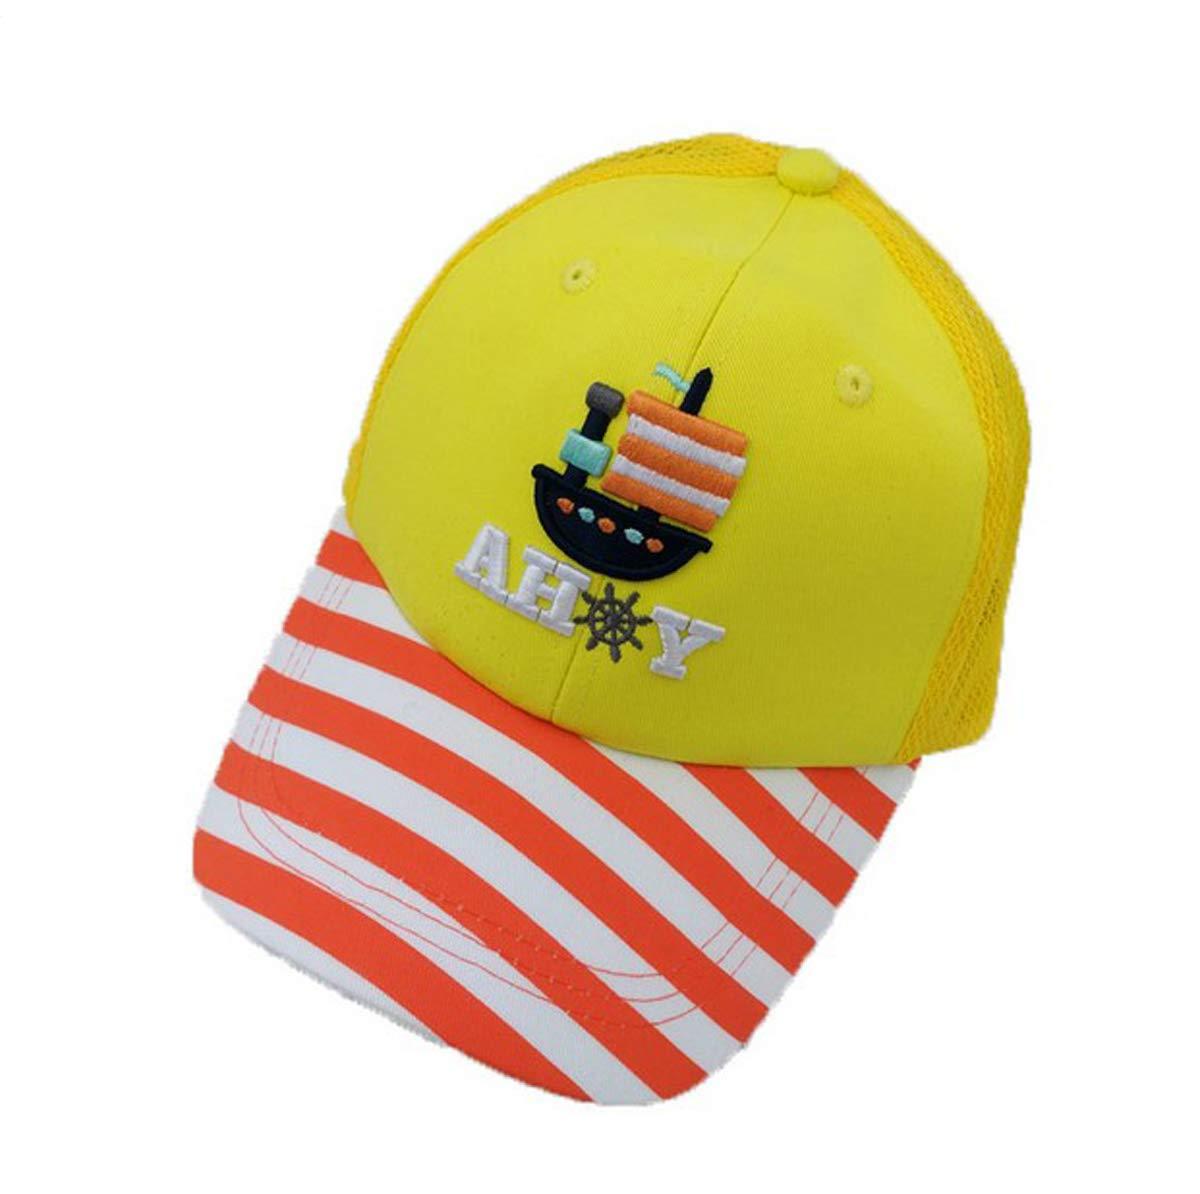 Ss - Gorra de béisbol para niños, diseño de Rayas de algodón ...